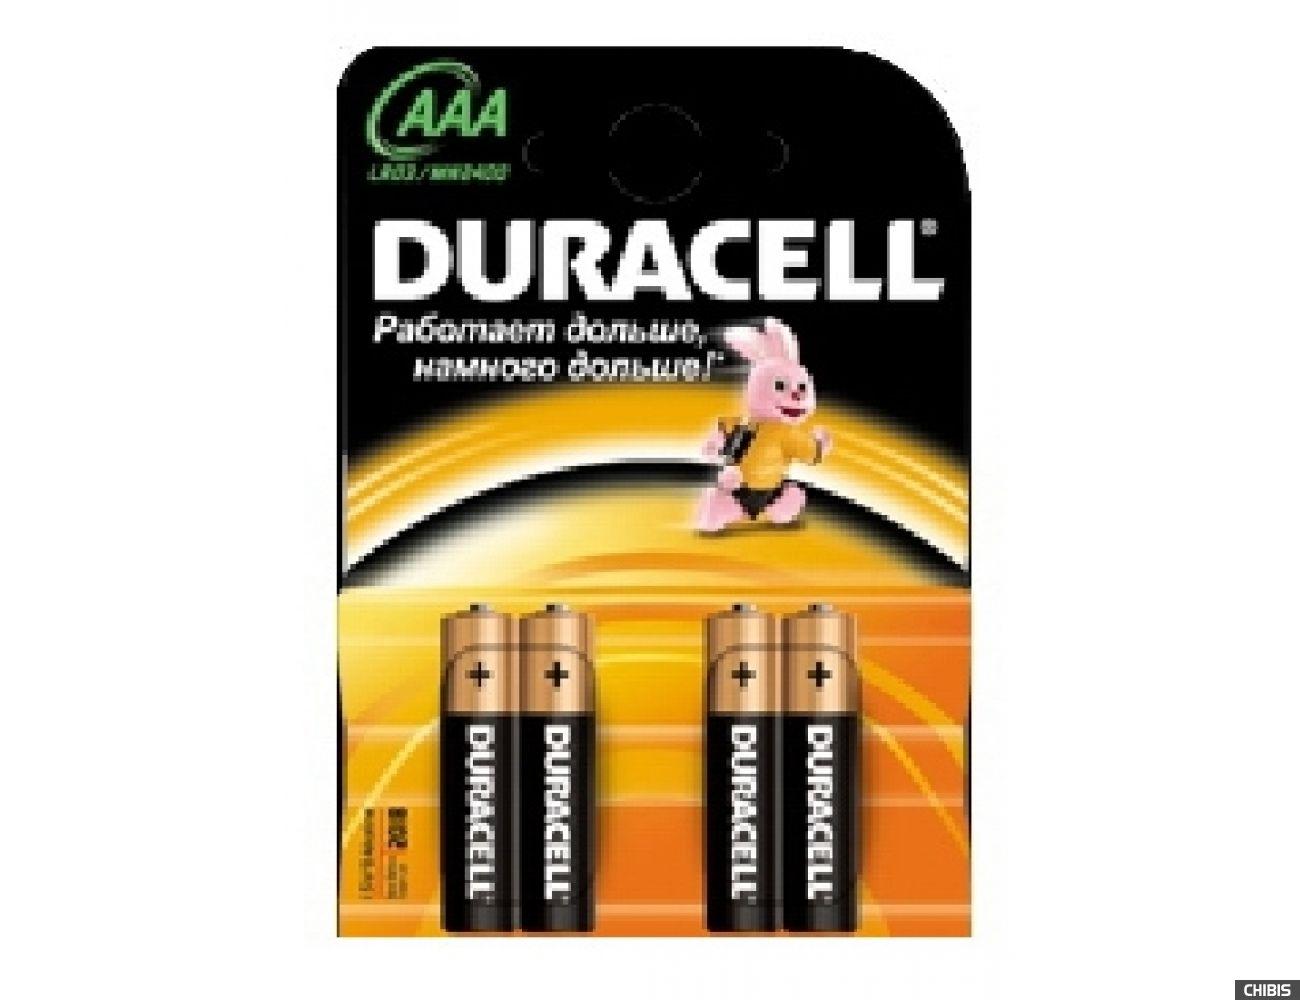 Батарейка Duracell AAA Basic (LR03, 1.5V, Alkaline  Щелочная) 4/4 шт. 5000394052543